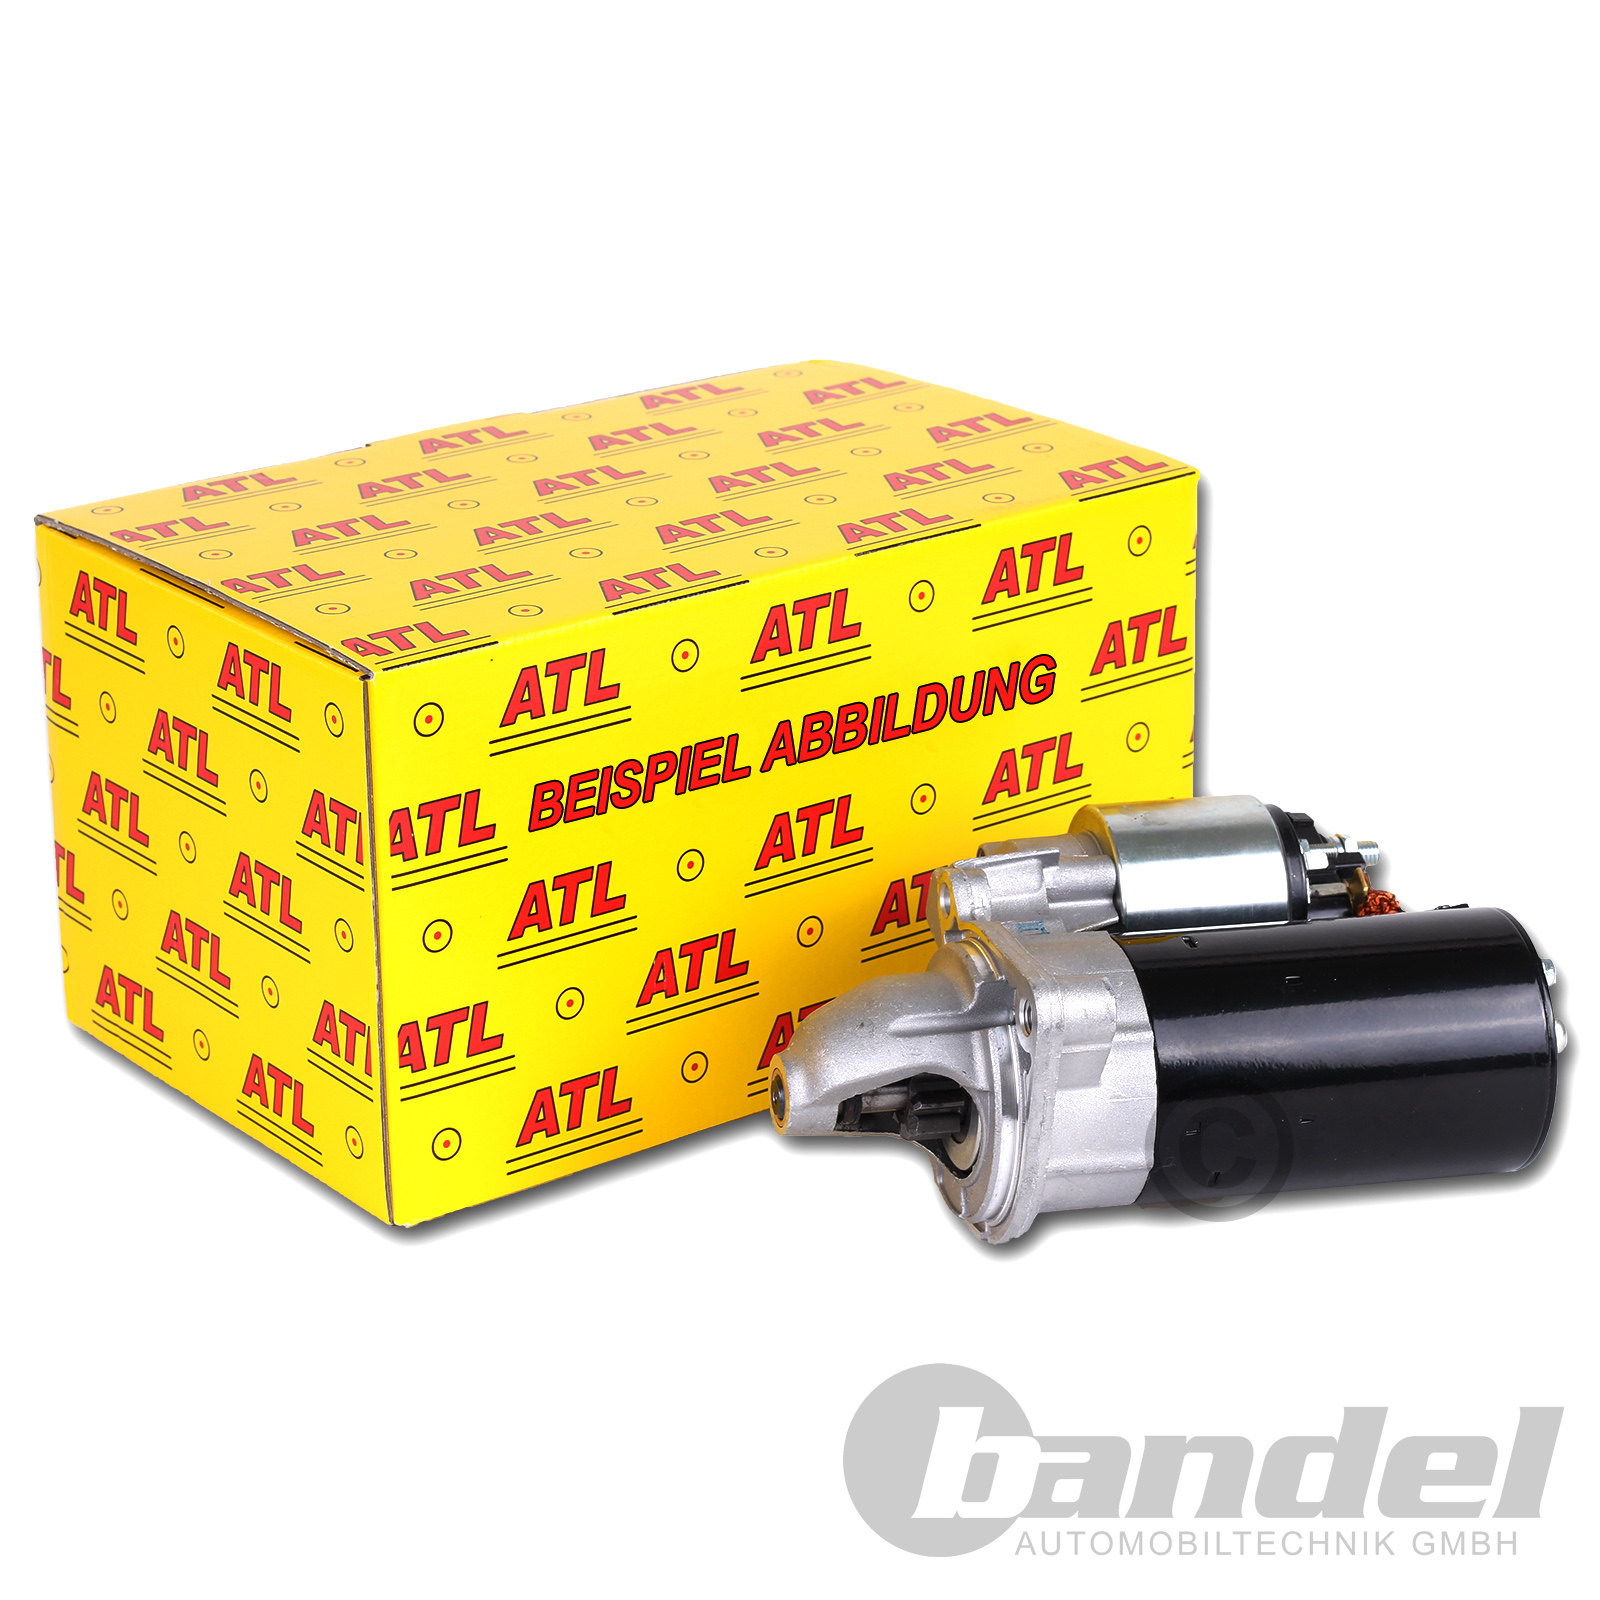 ATL ANLASSER STARTER 0,9 kW DAEWOO Lacetti Lanos FIAT Stilo OPEL Astra F G H